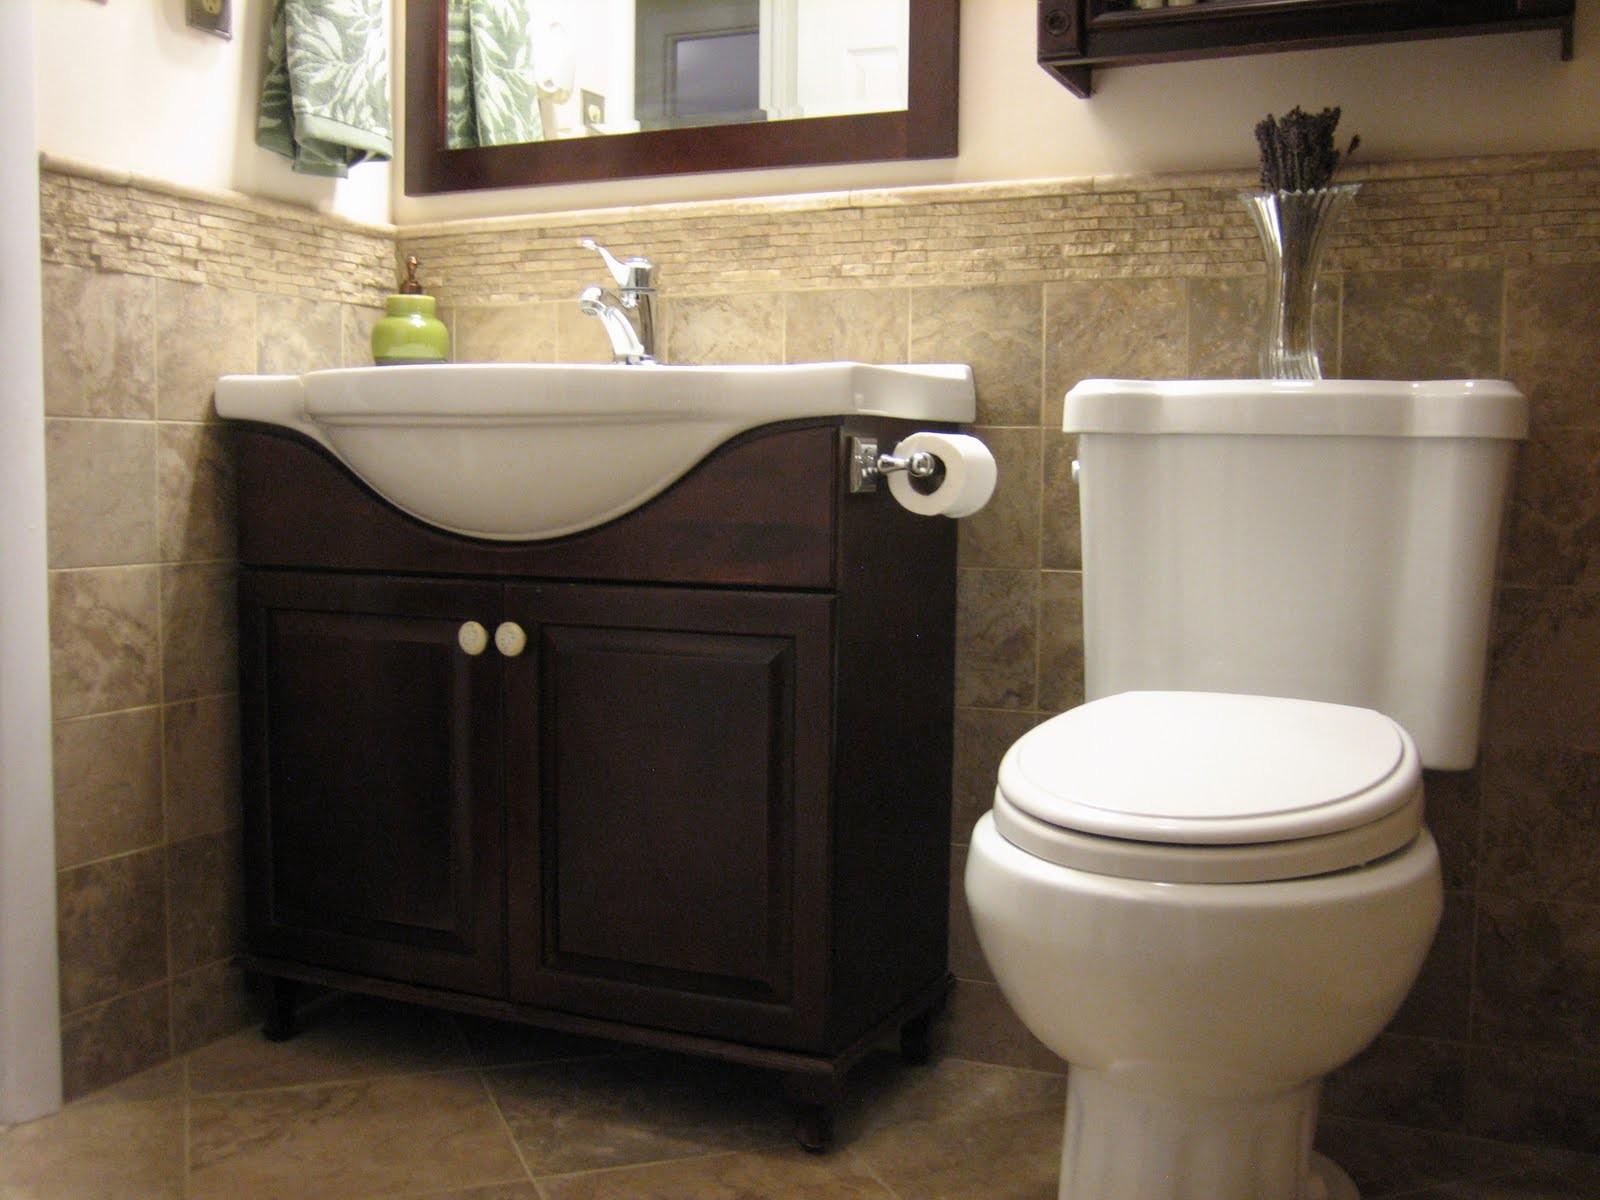 Half Bathroom Tile Ideas Pwinteriors Bathroom Theydesign With Bathroom Tile Decorating Ideas Bathroom Tile Decorating Ideas Interior Design Center Inspiration